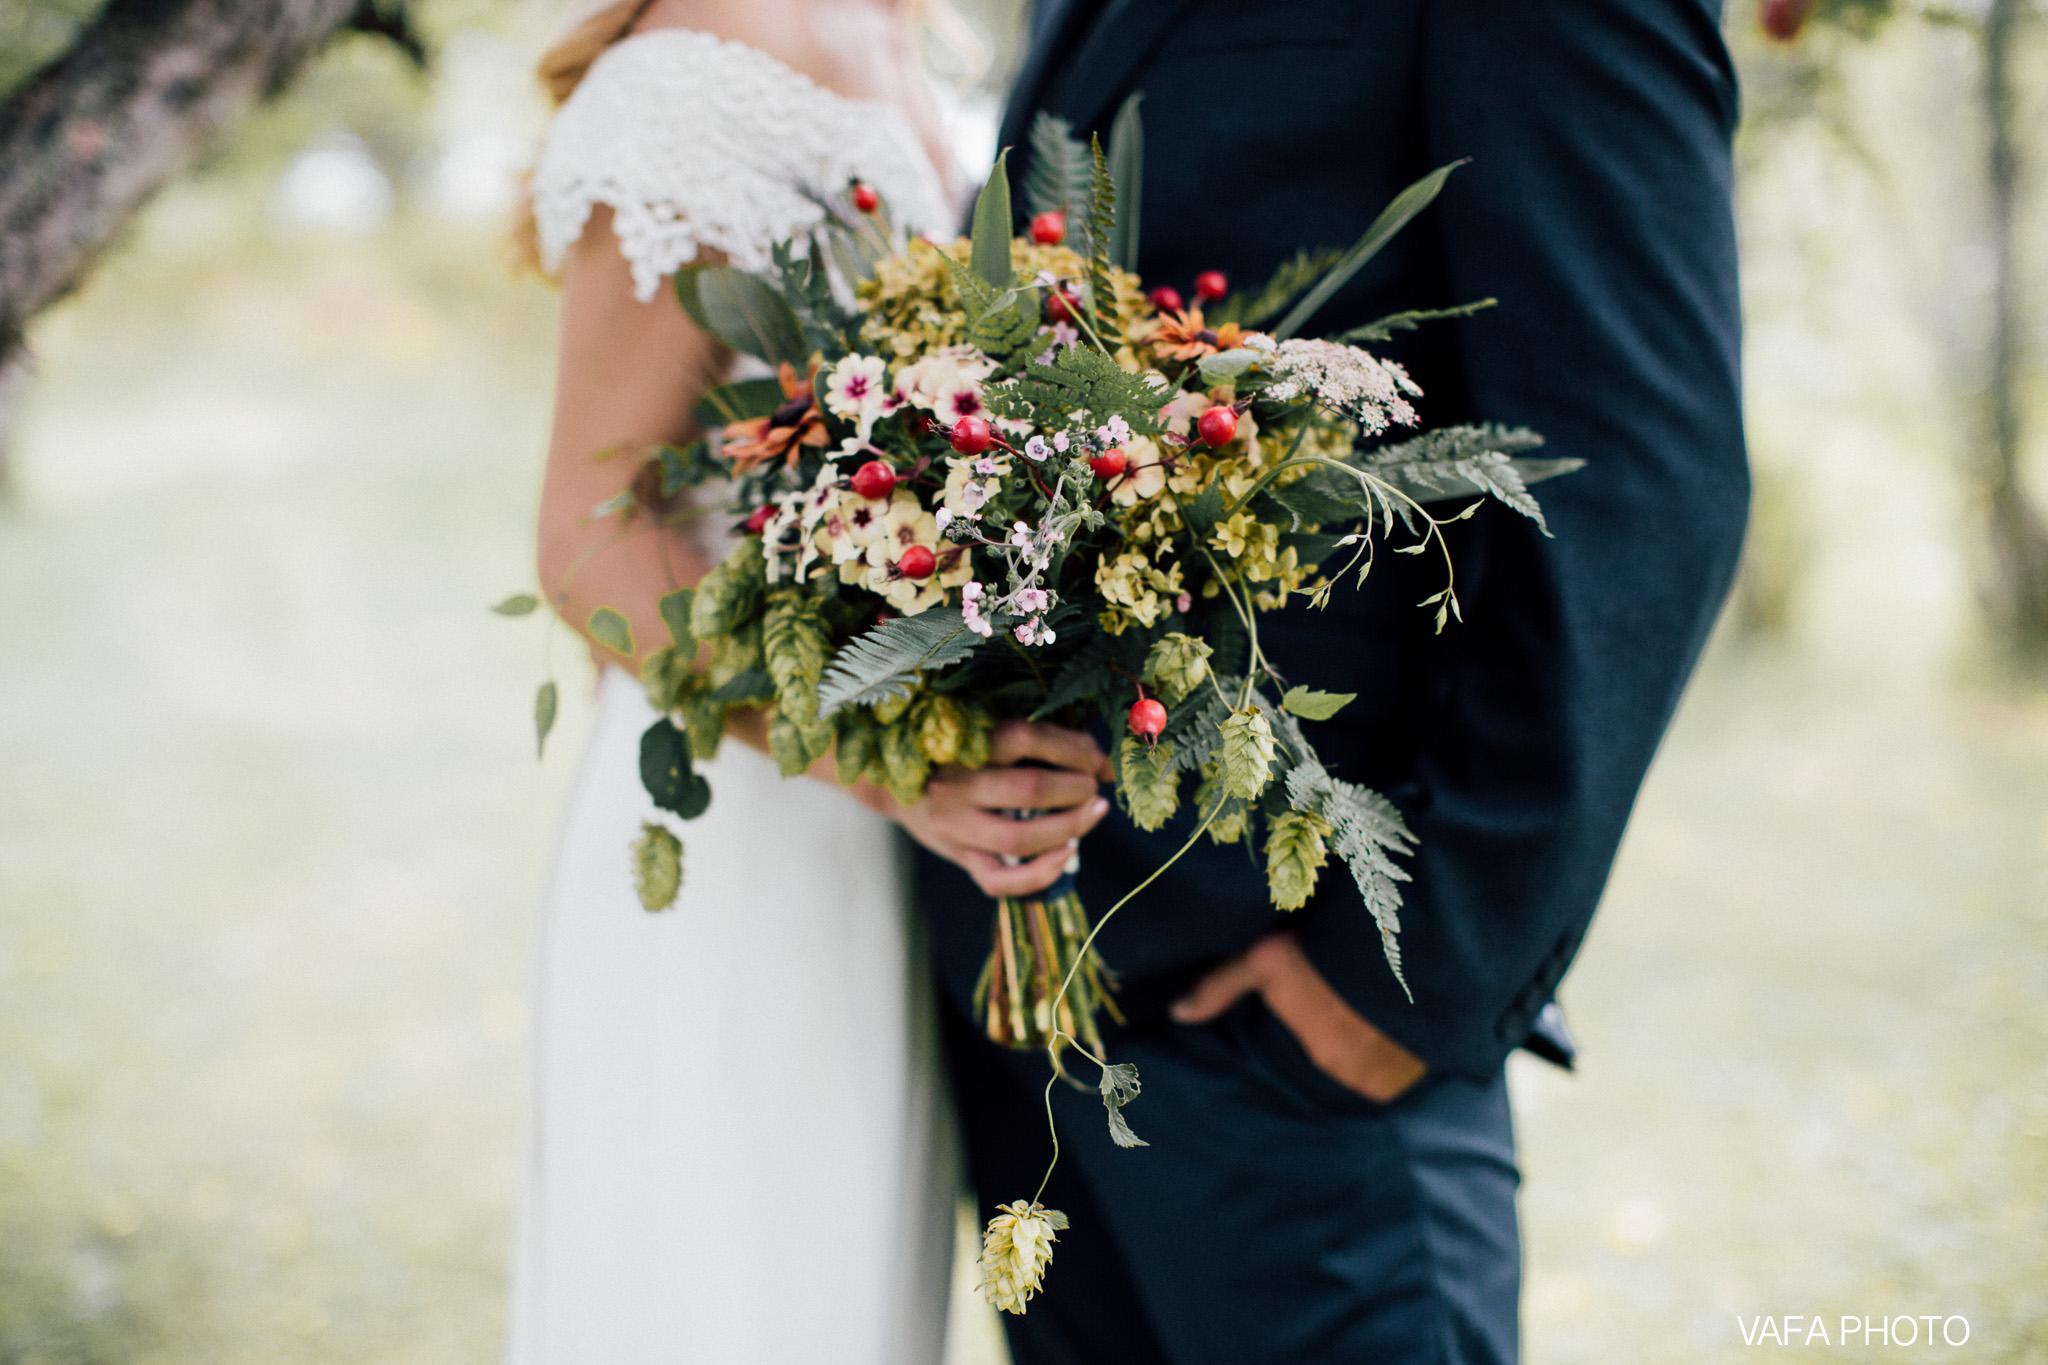 Belsolda-Farm-Wedding-Christy-Eric-Vafa-Photo-82.jpg